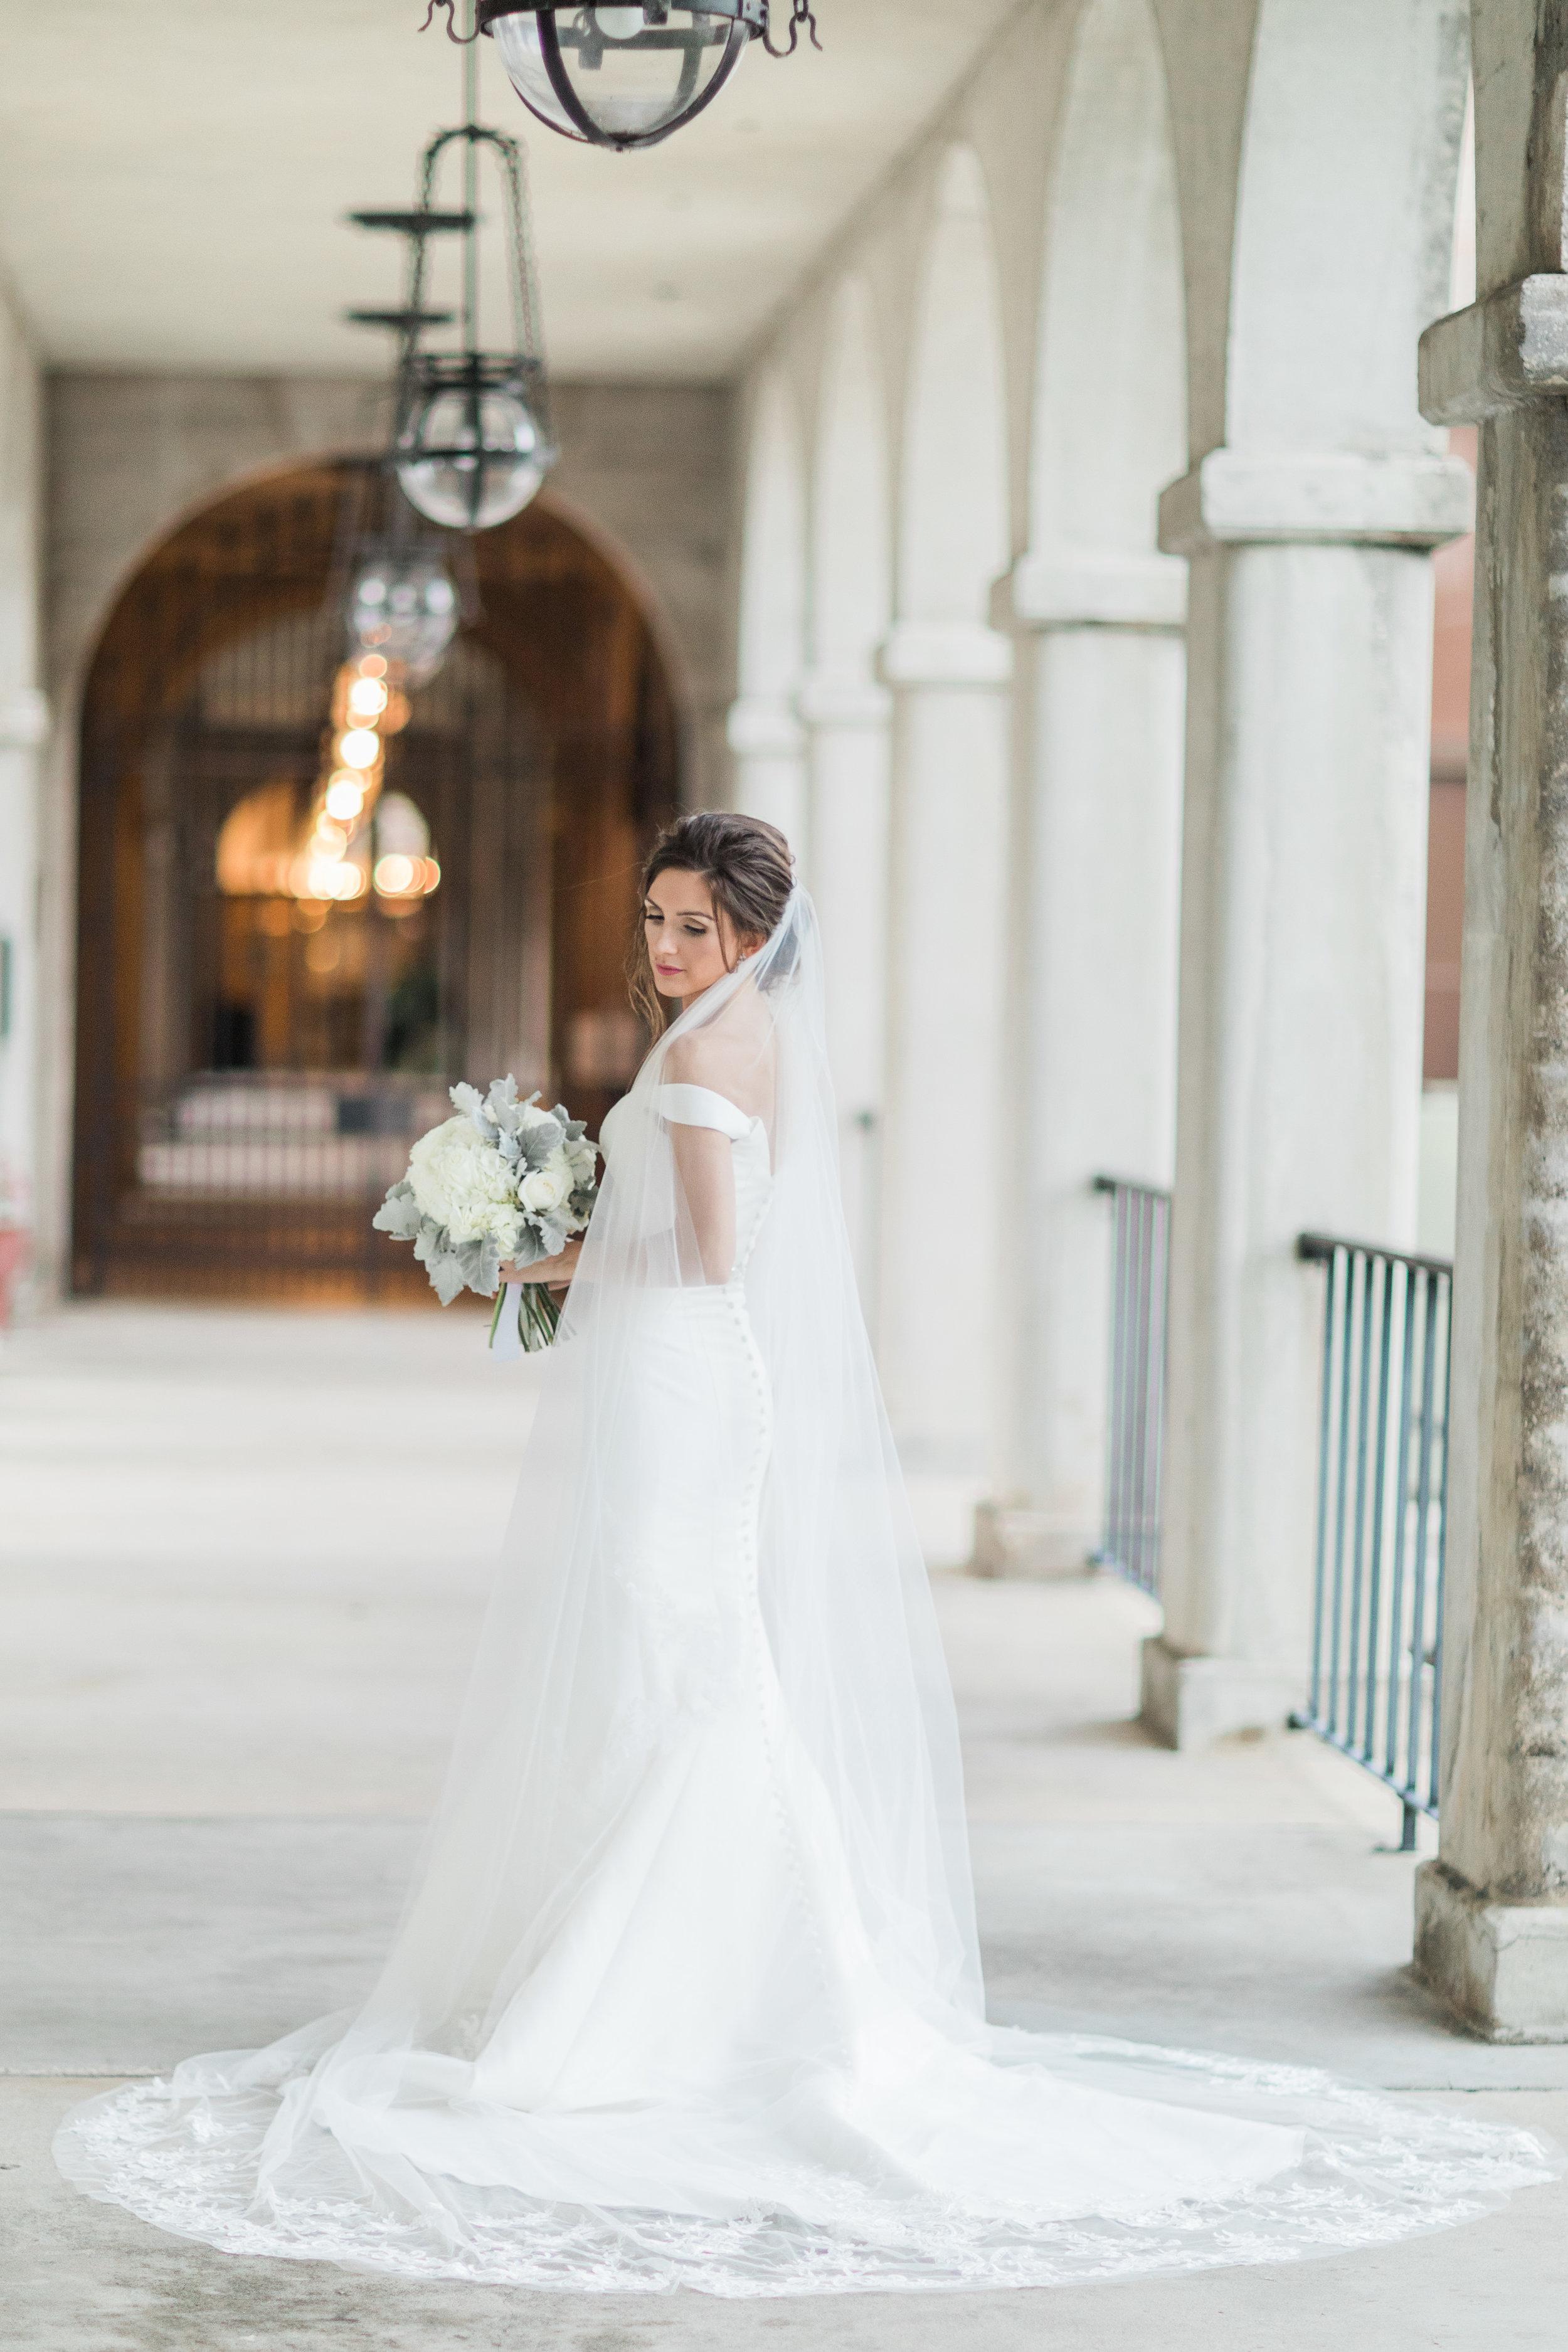 Taylor_TJ_St_Augustine_Treasury_on_the_Plaza_Wedding_Photography__0037_-37.jpg